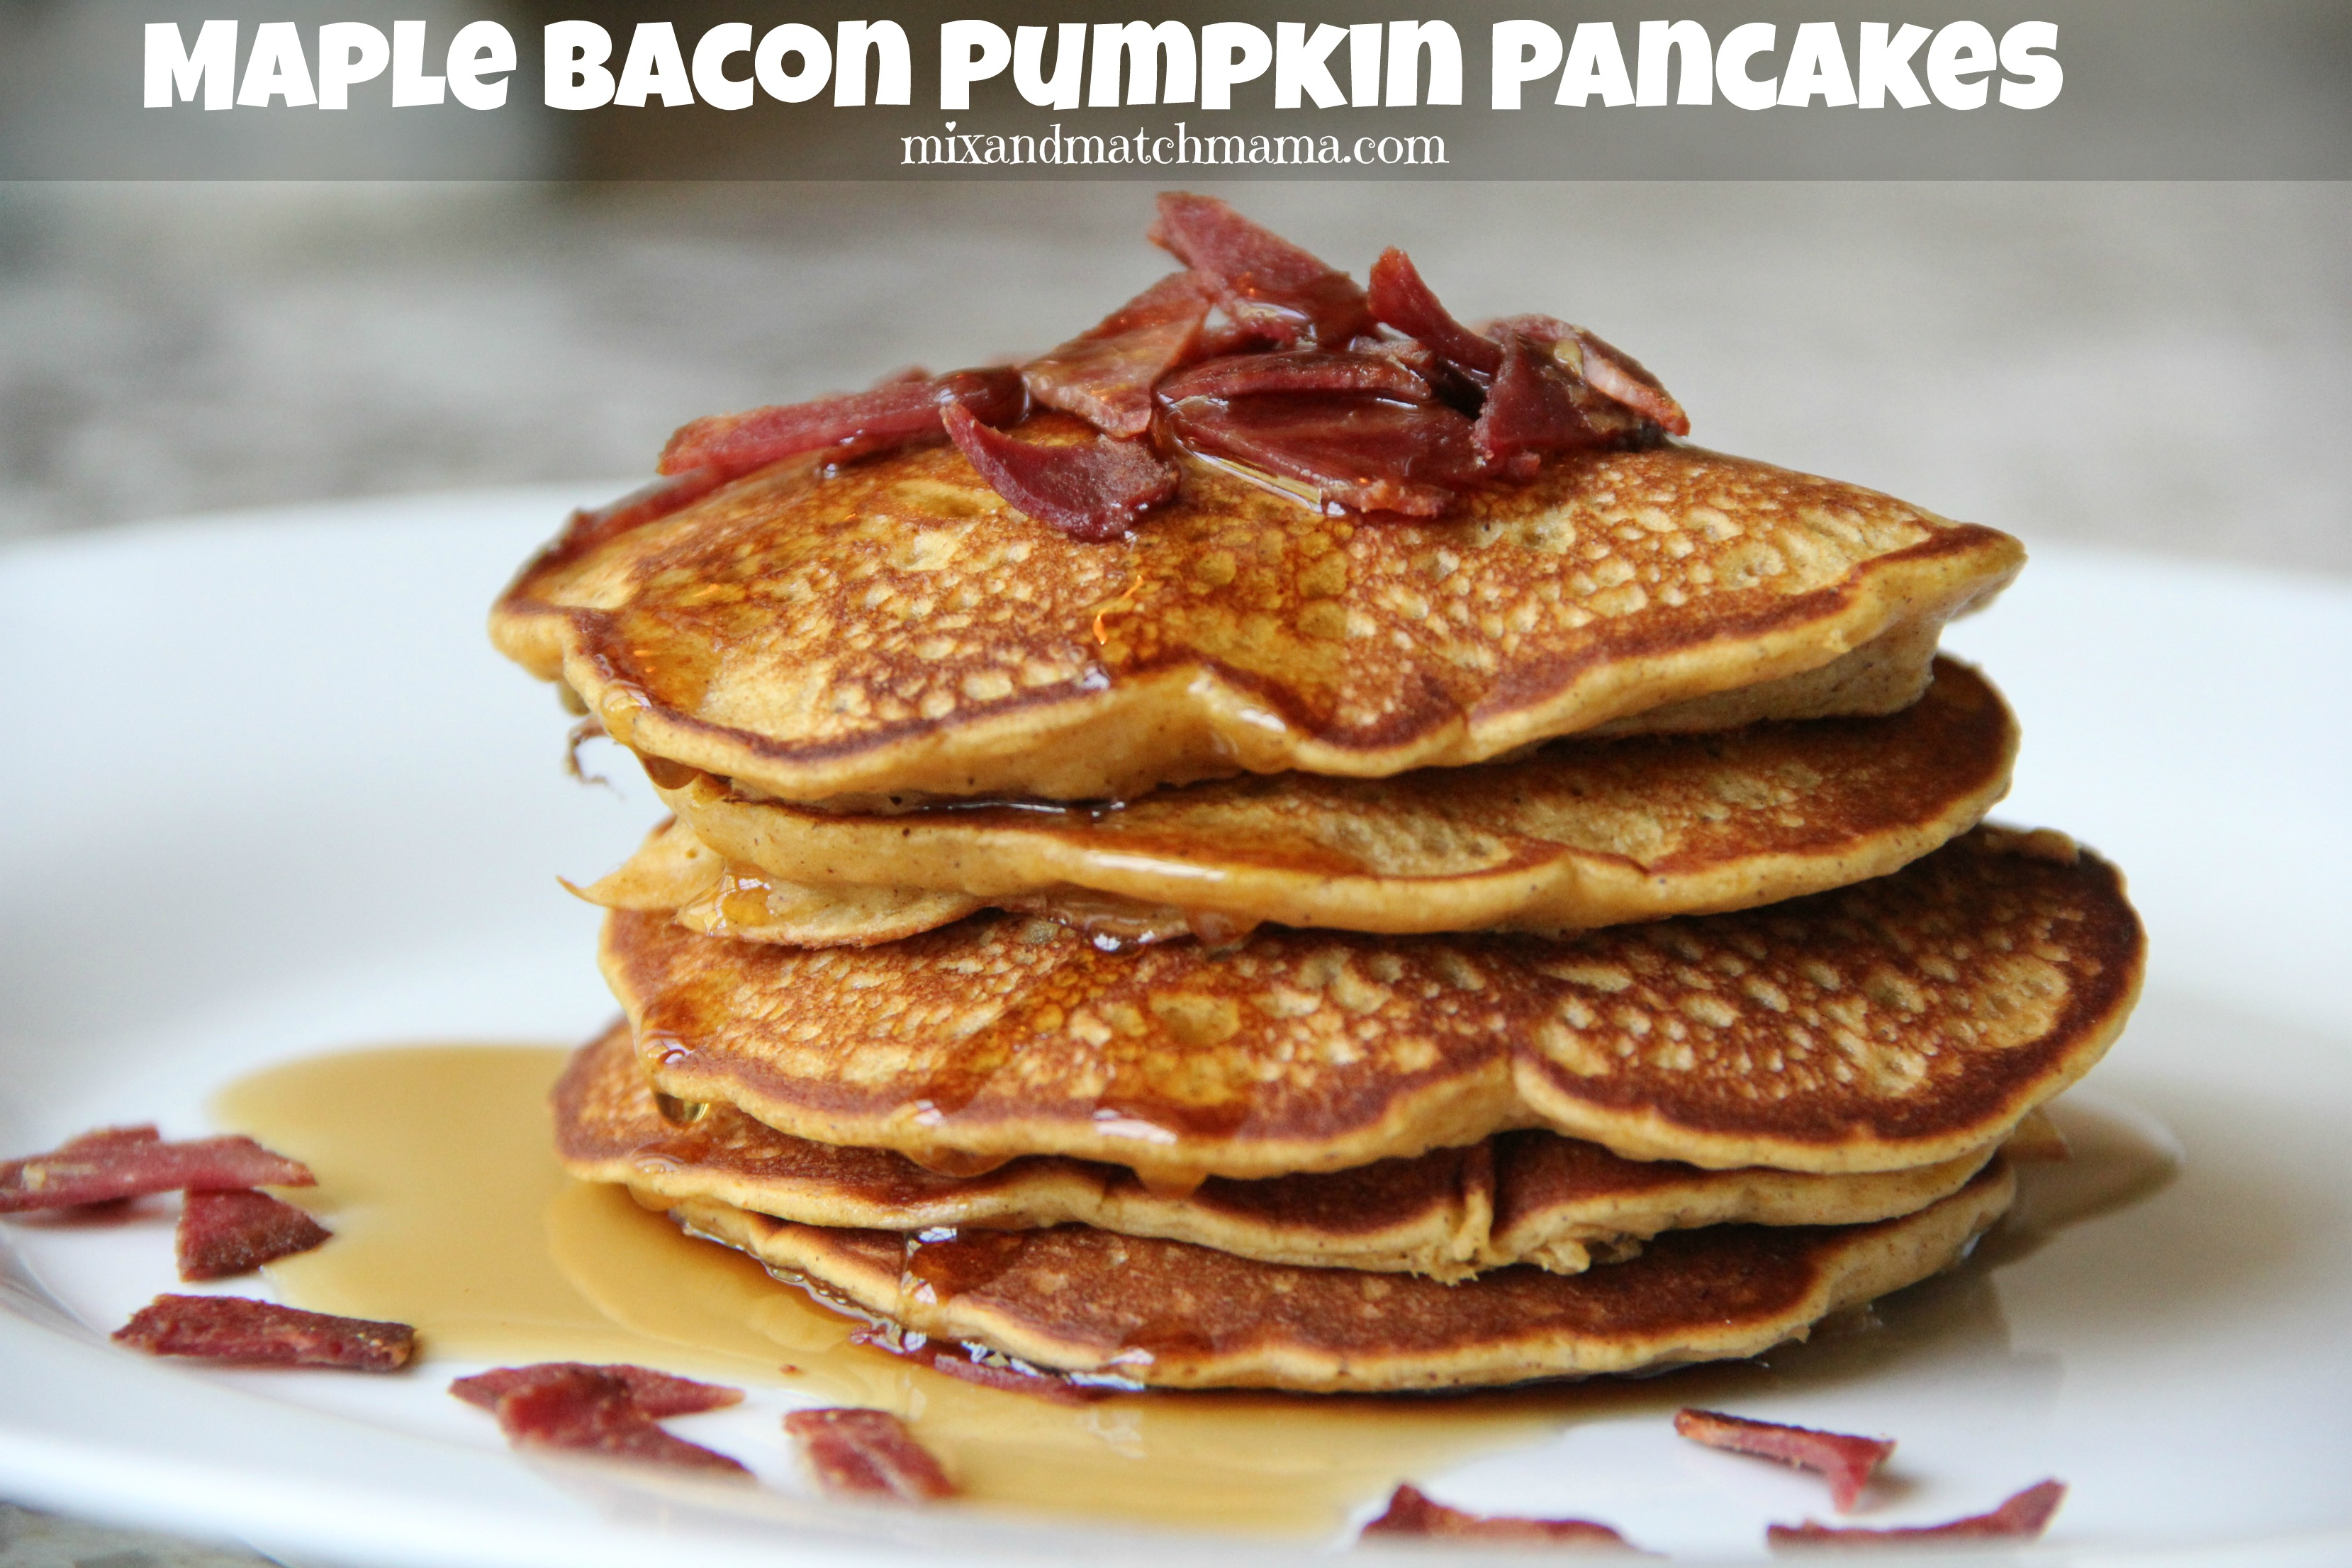 Maple Bacon Pumpkin Pancakes